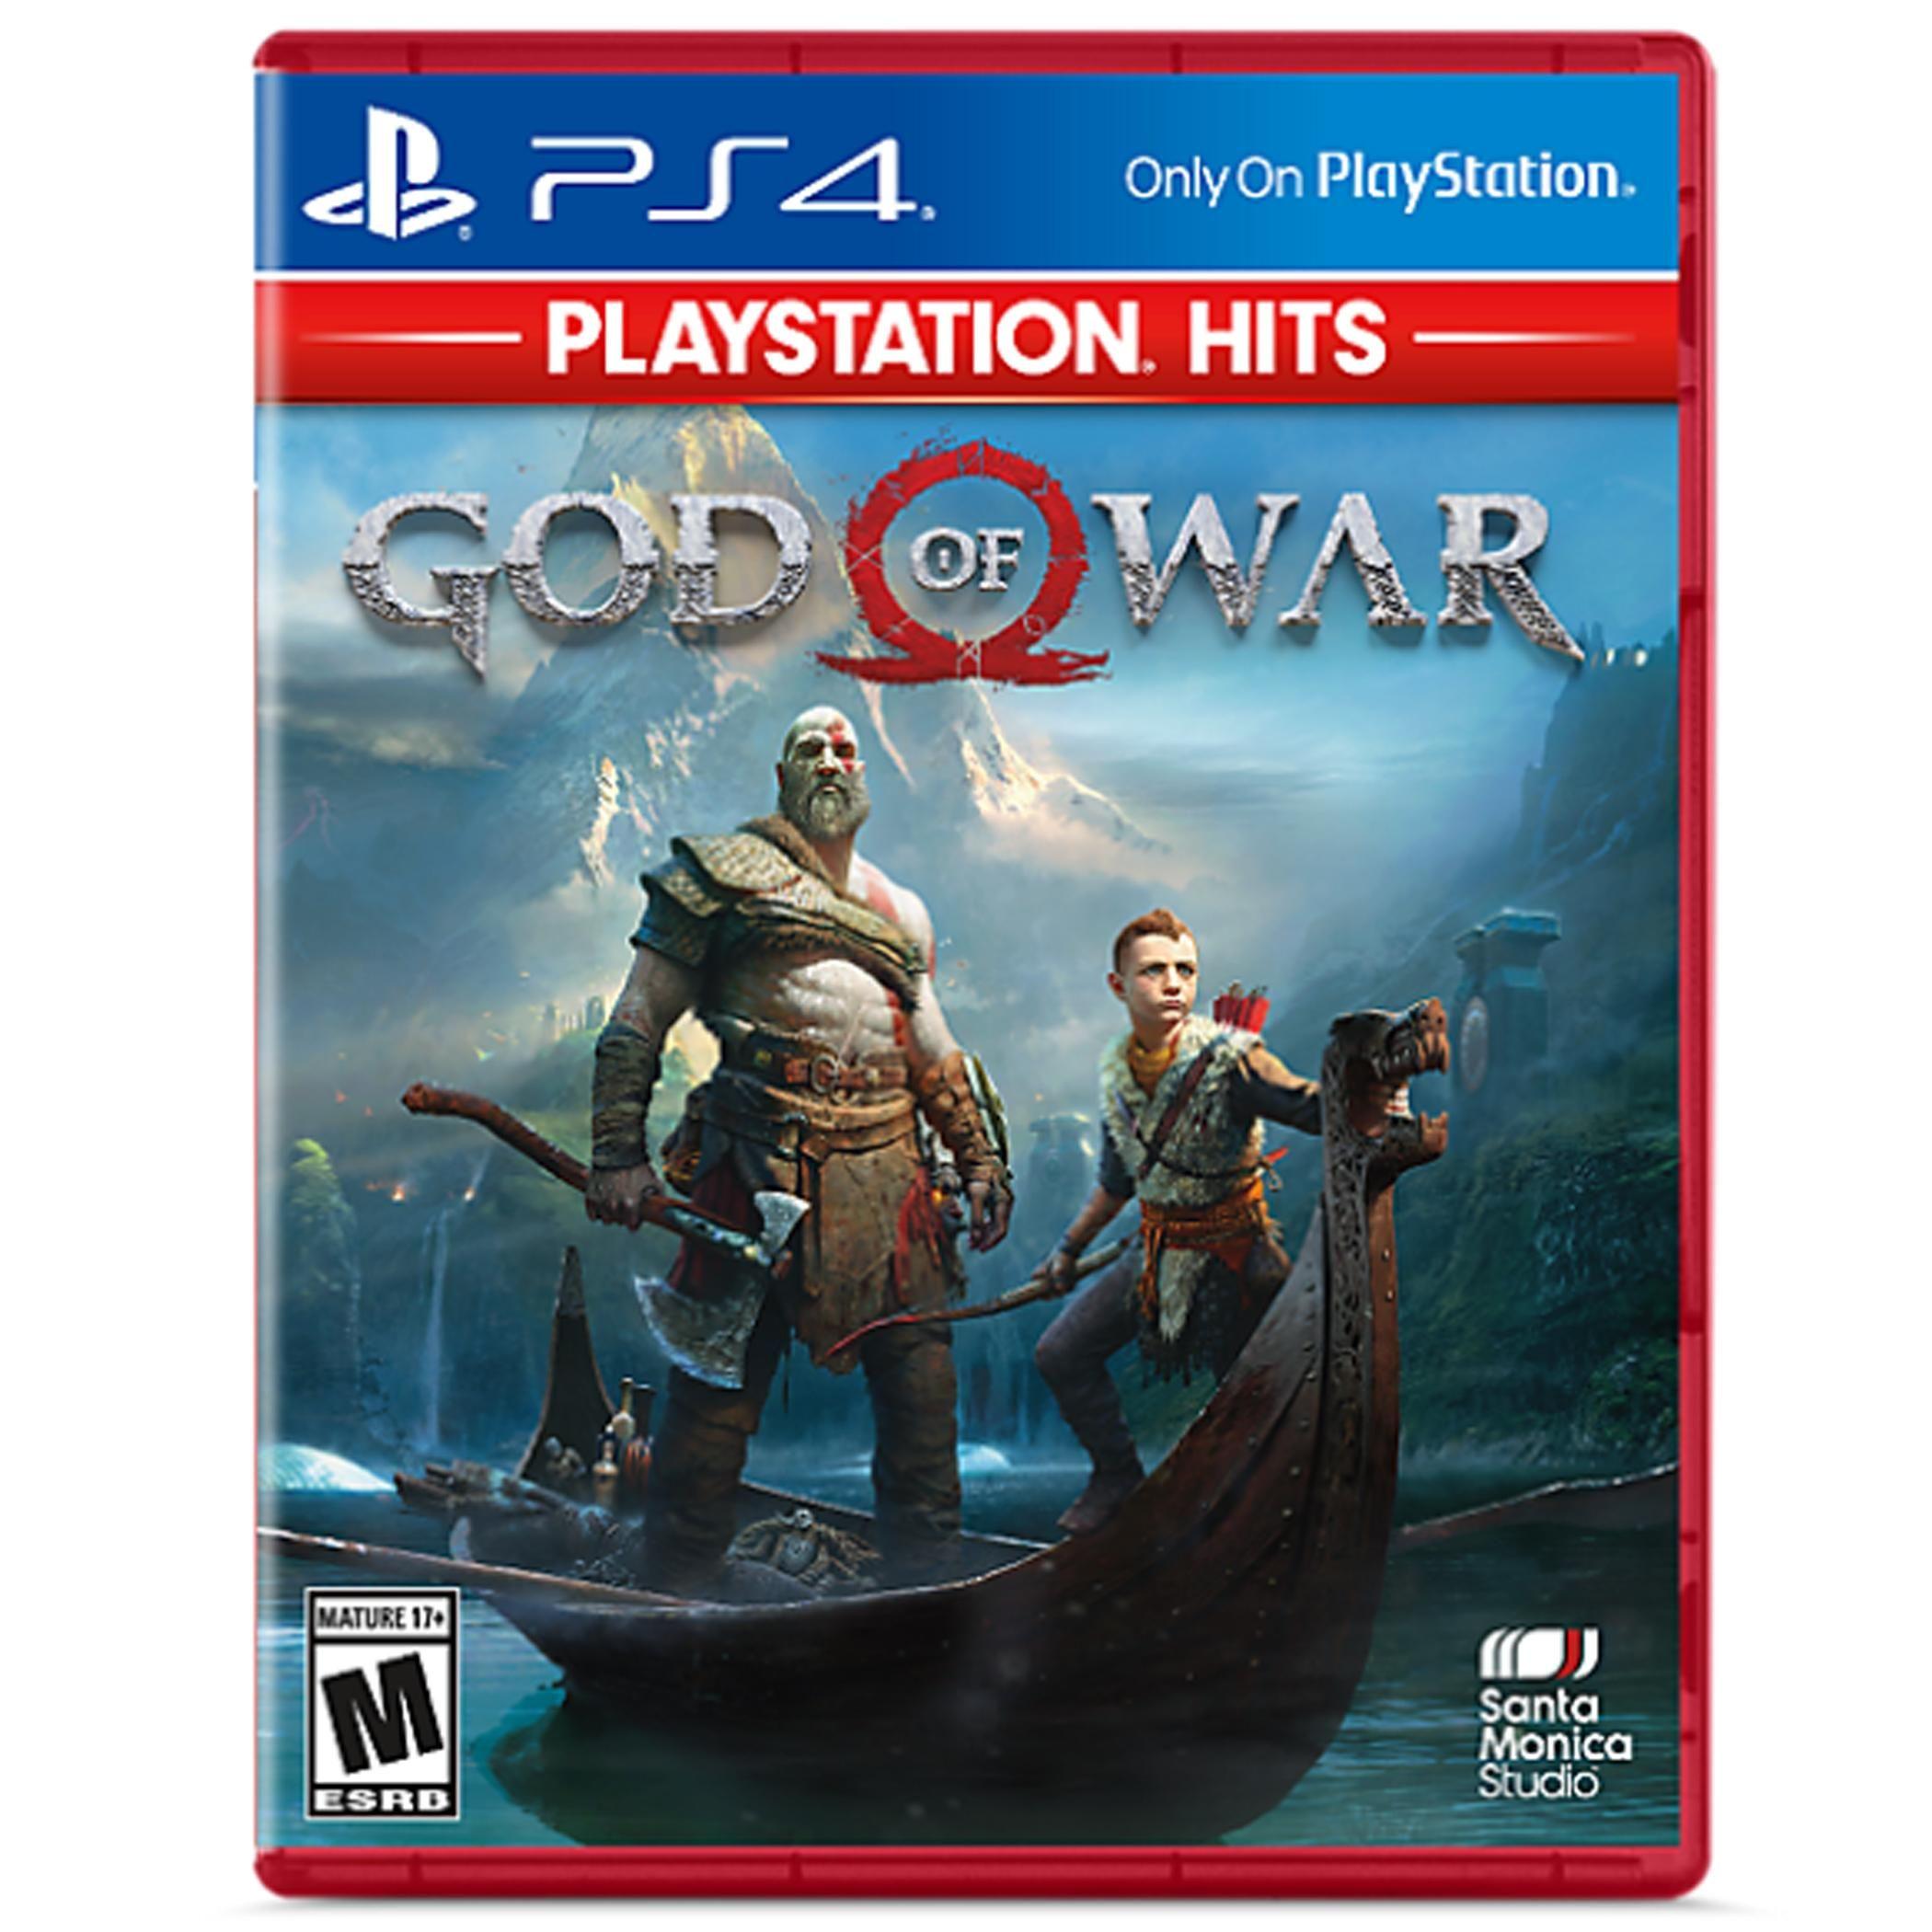 God Of War Playstation Hits Playstation 4 Nfm In 2021 God Of War Playstation Ps4 Games